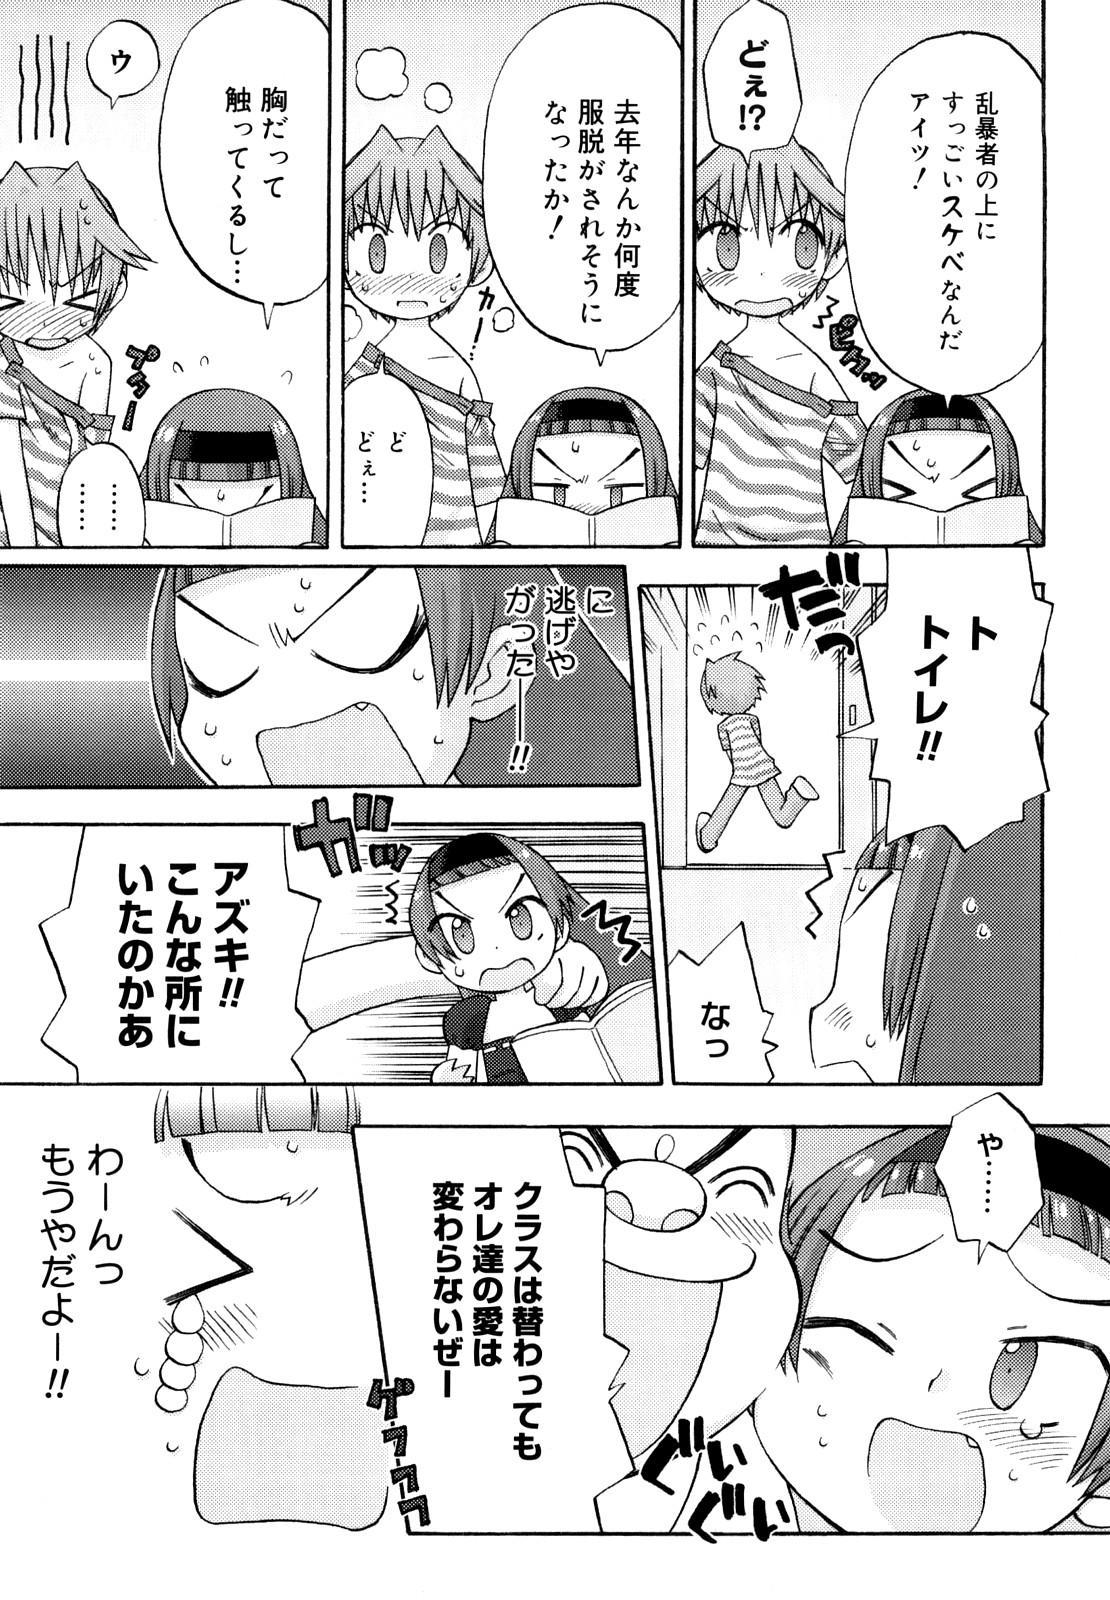 Hatsuden Pandakun! Shinsouban 23